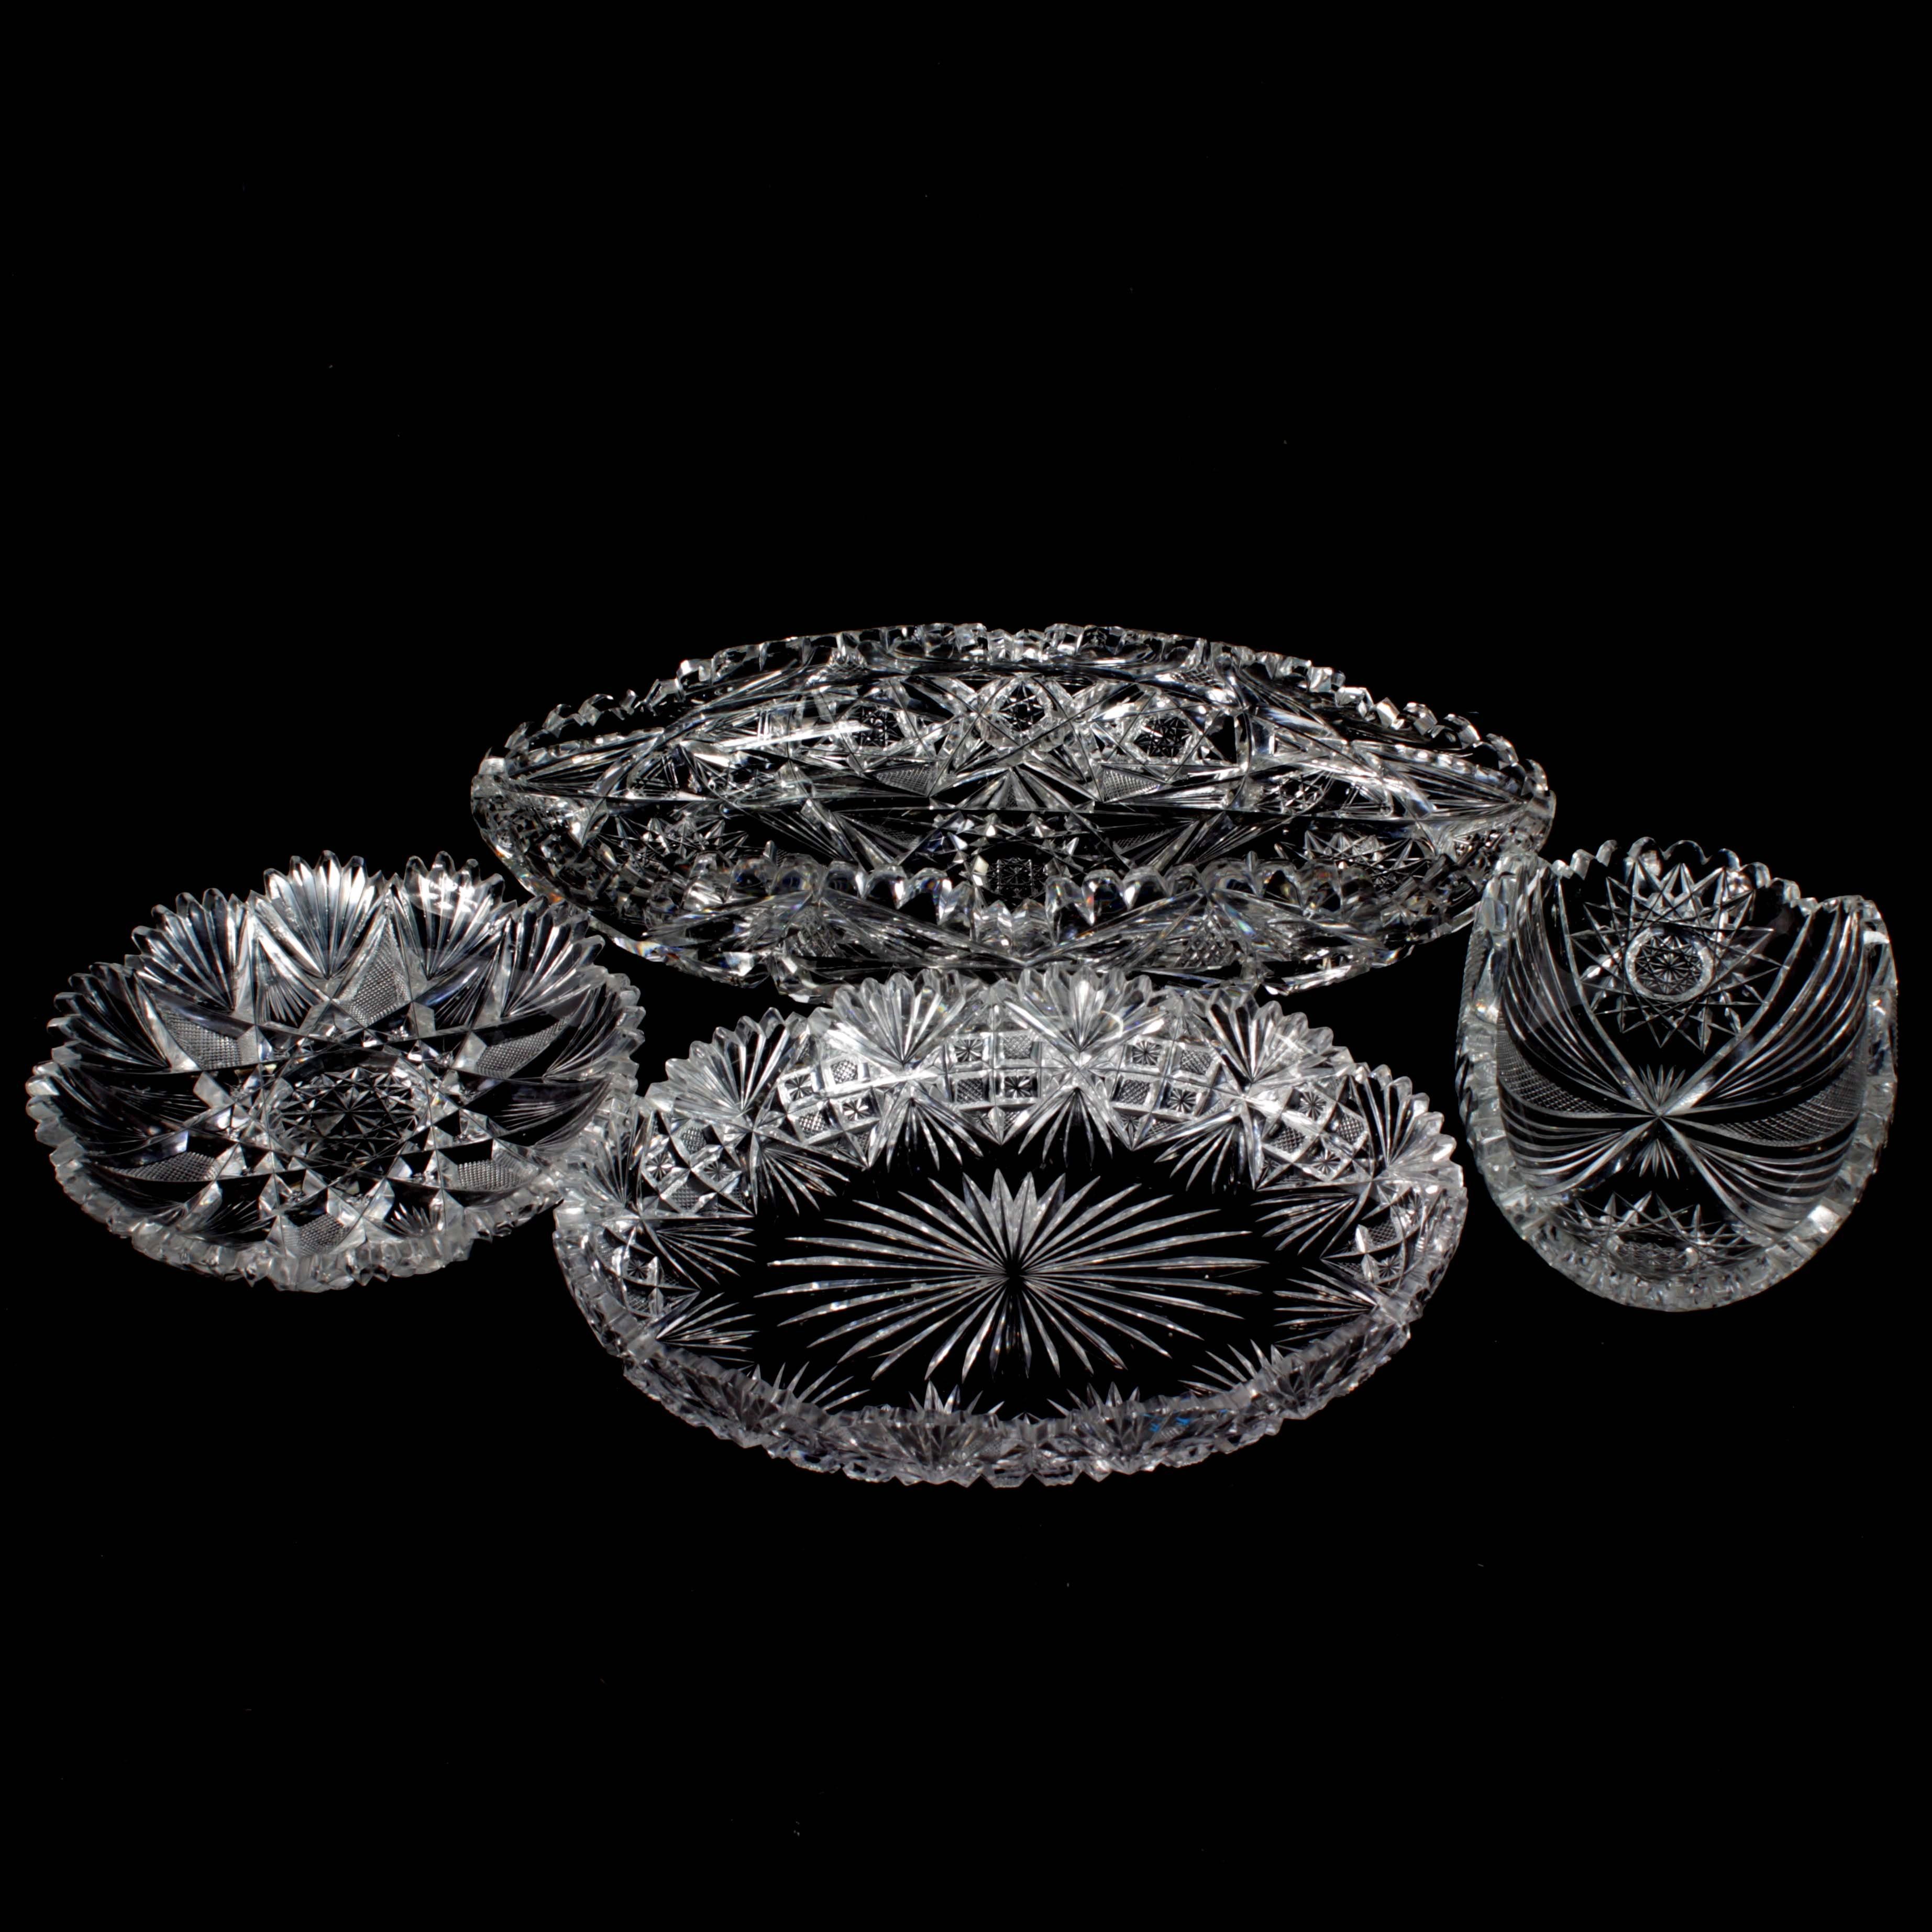 Collection of American Brilliant Period Cut Glass